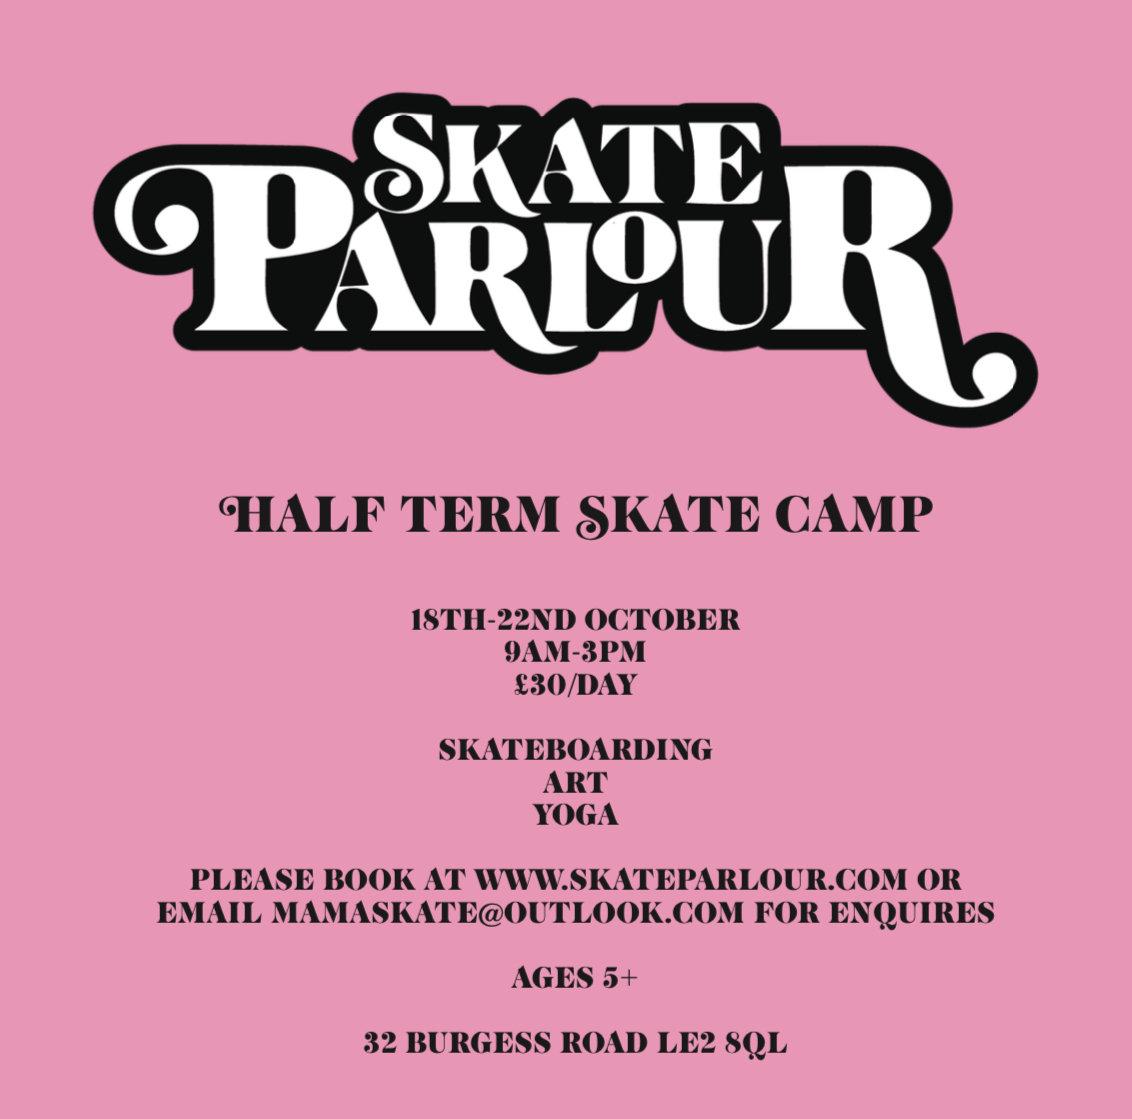 Half Term Skate Camp